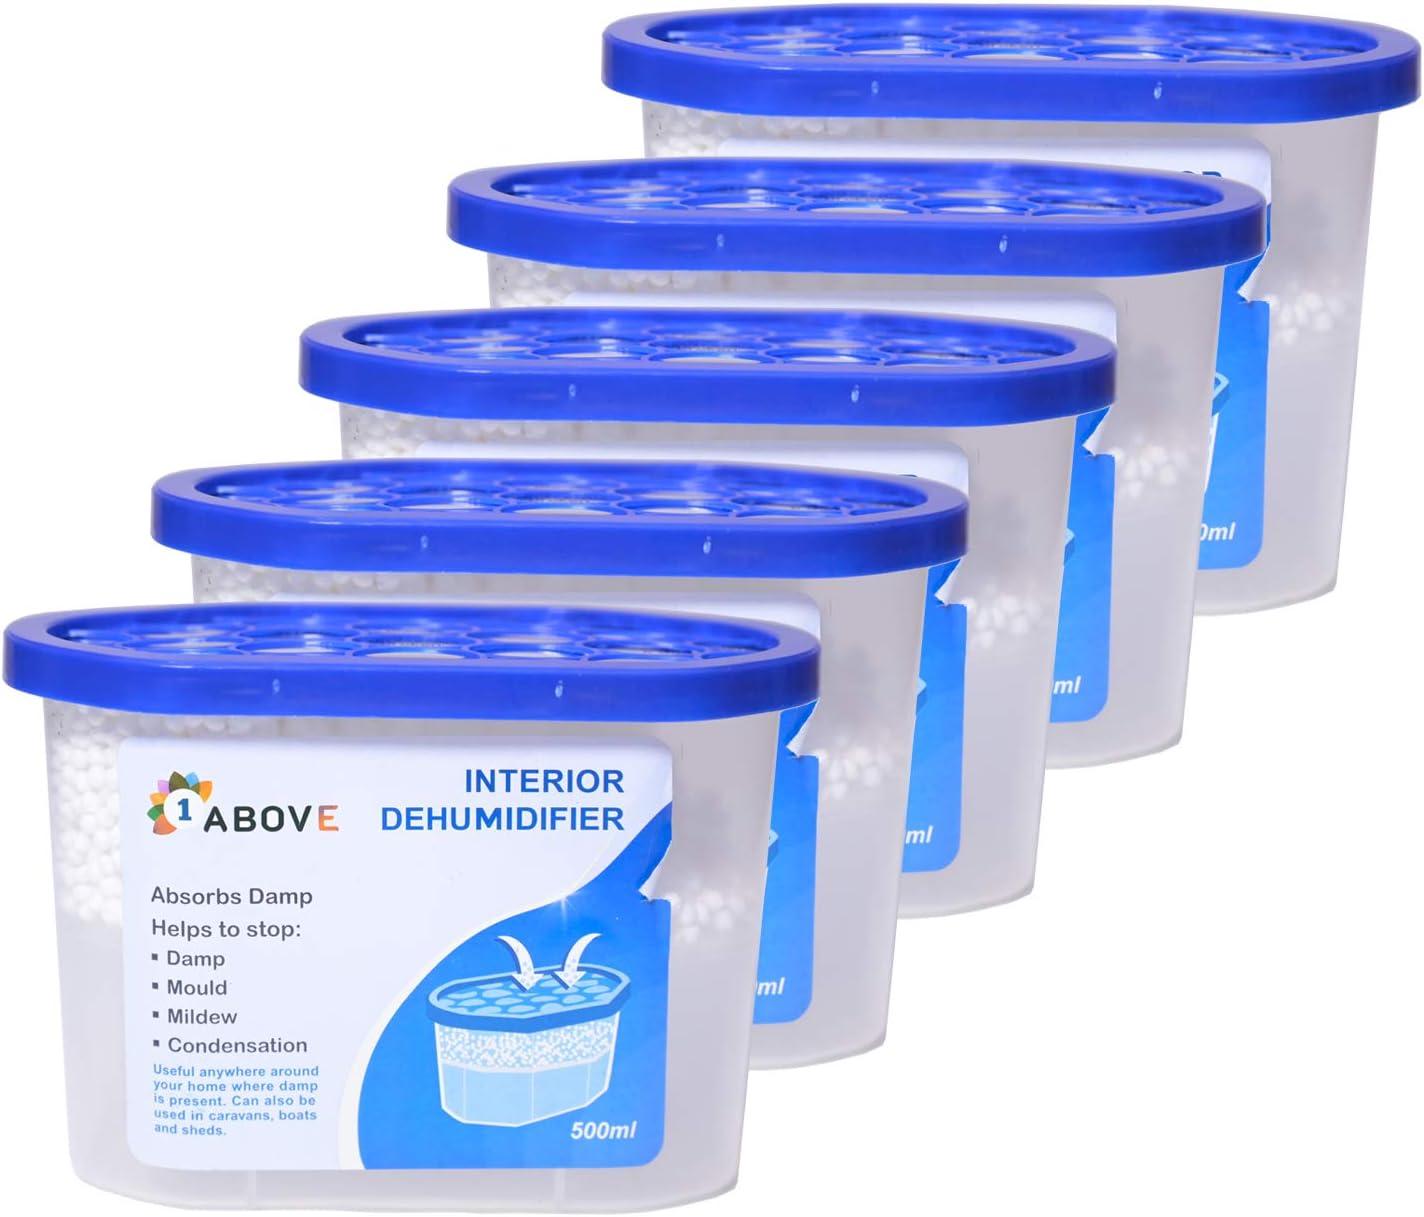 1 Bedroom 210 g Dehumidifiers for Damp Hanging Wardrobe Dehumidifier Basement Bathroom Moisture Absorber Mould Caravan Condensation Remover Moisture in Wardrobe